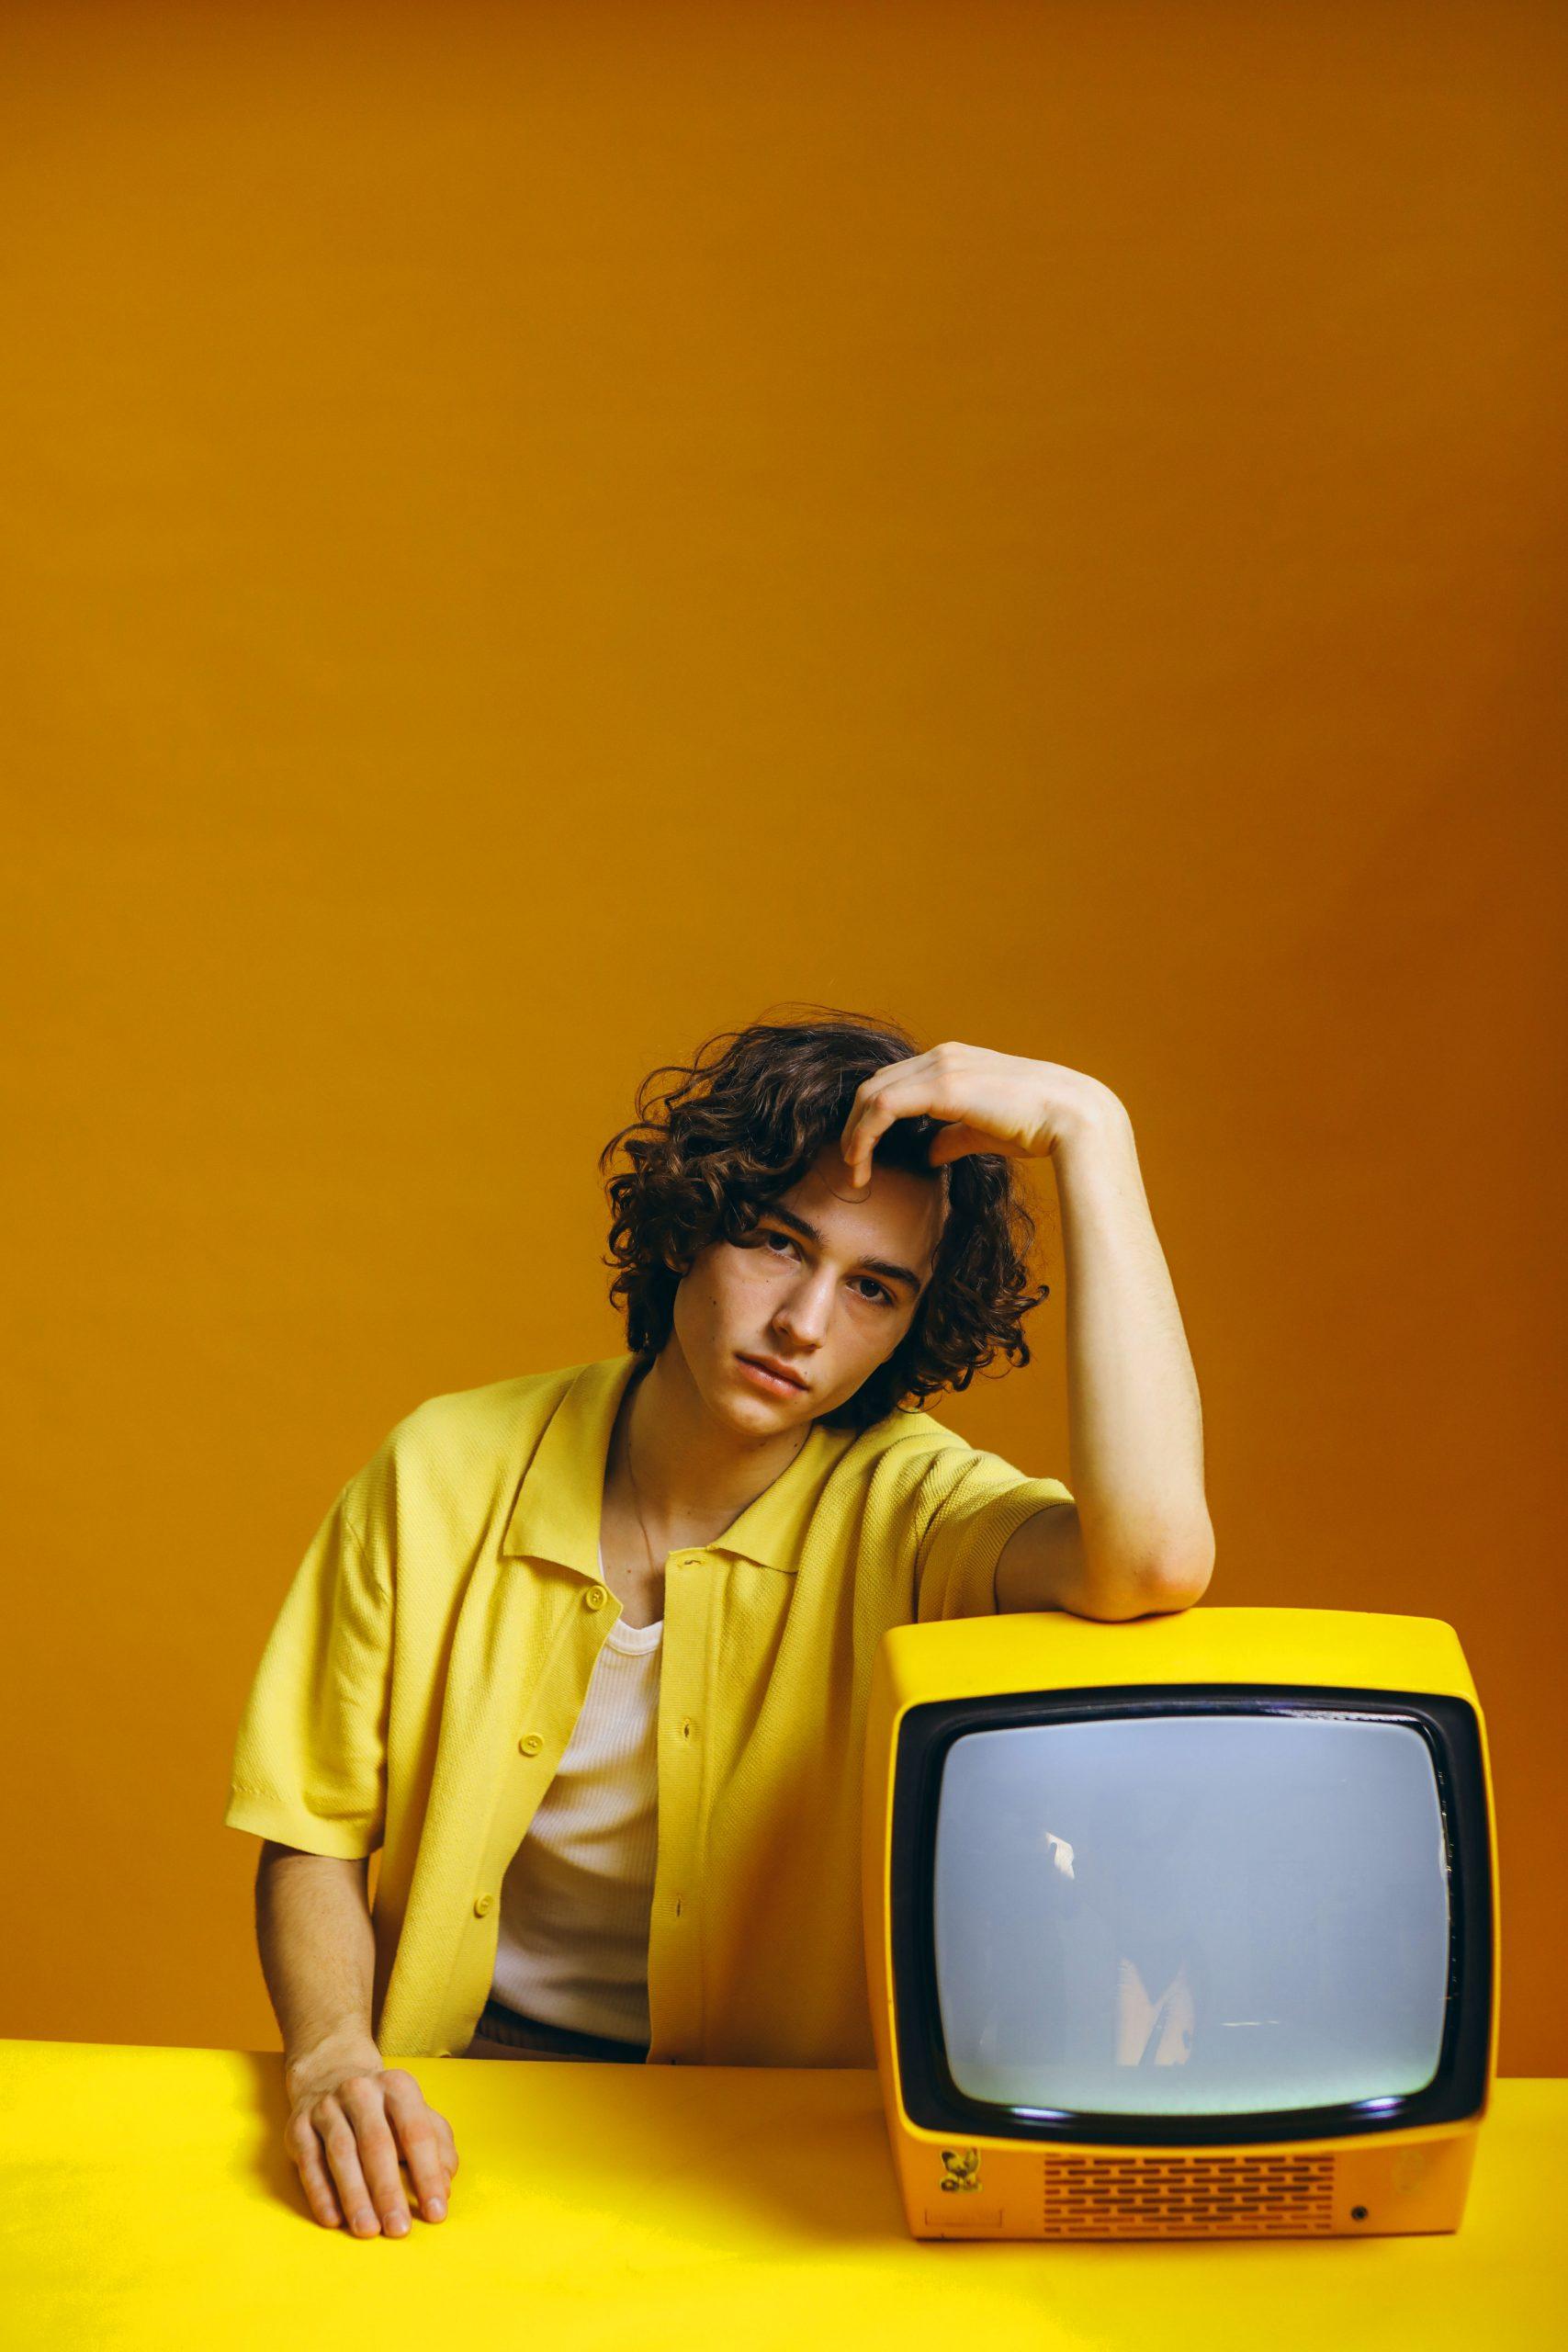 Latest Sad Boy Dp Images wallpaper pics free download